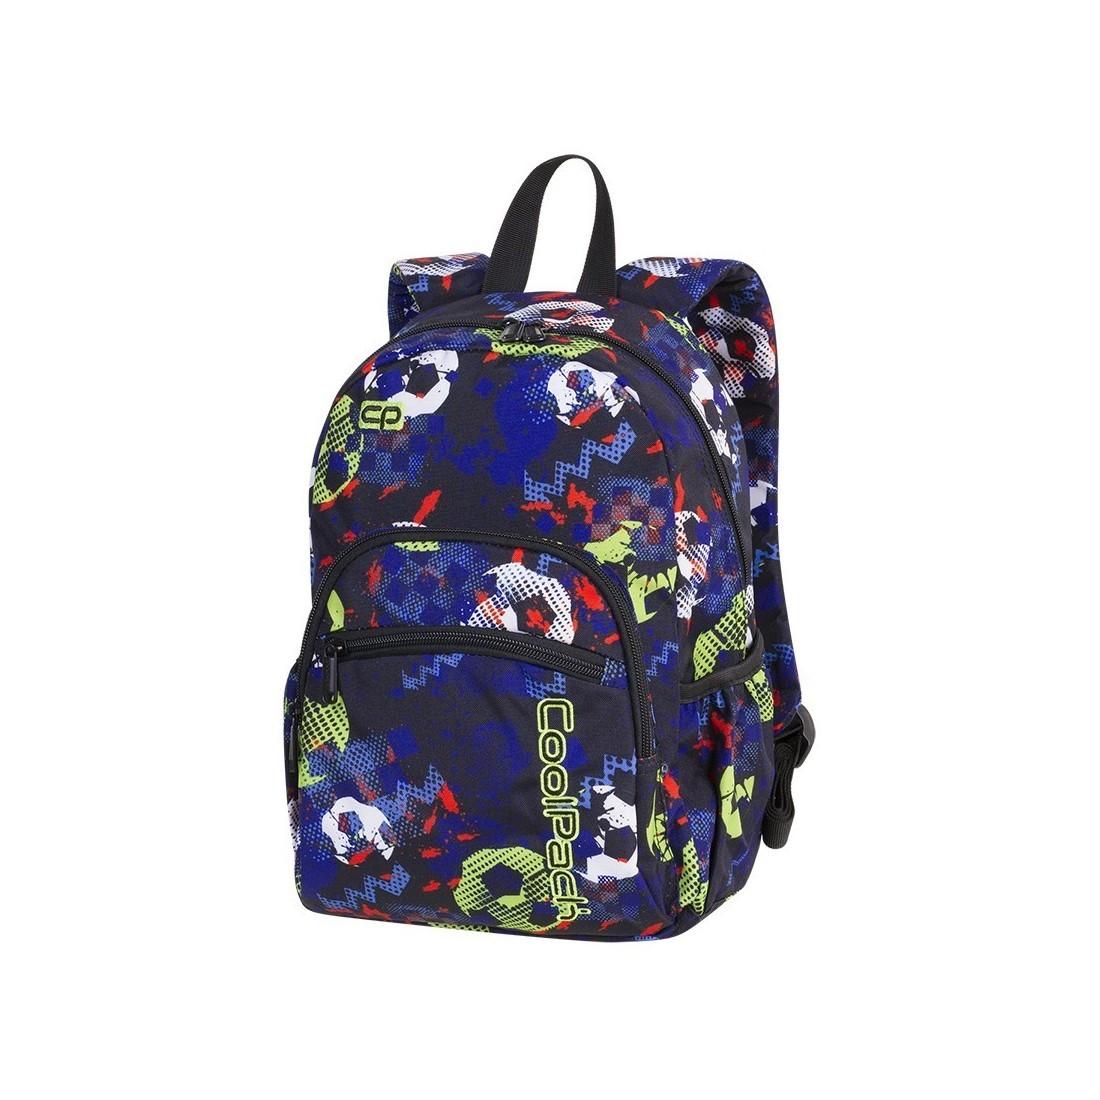 3fc41aec39b3b Plecak mały MINI FOOTBALL najmniejszy model marki CoolPack dla chłopaka  kolorowe piłki - A189